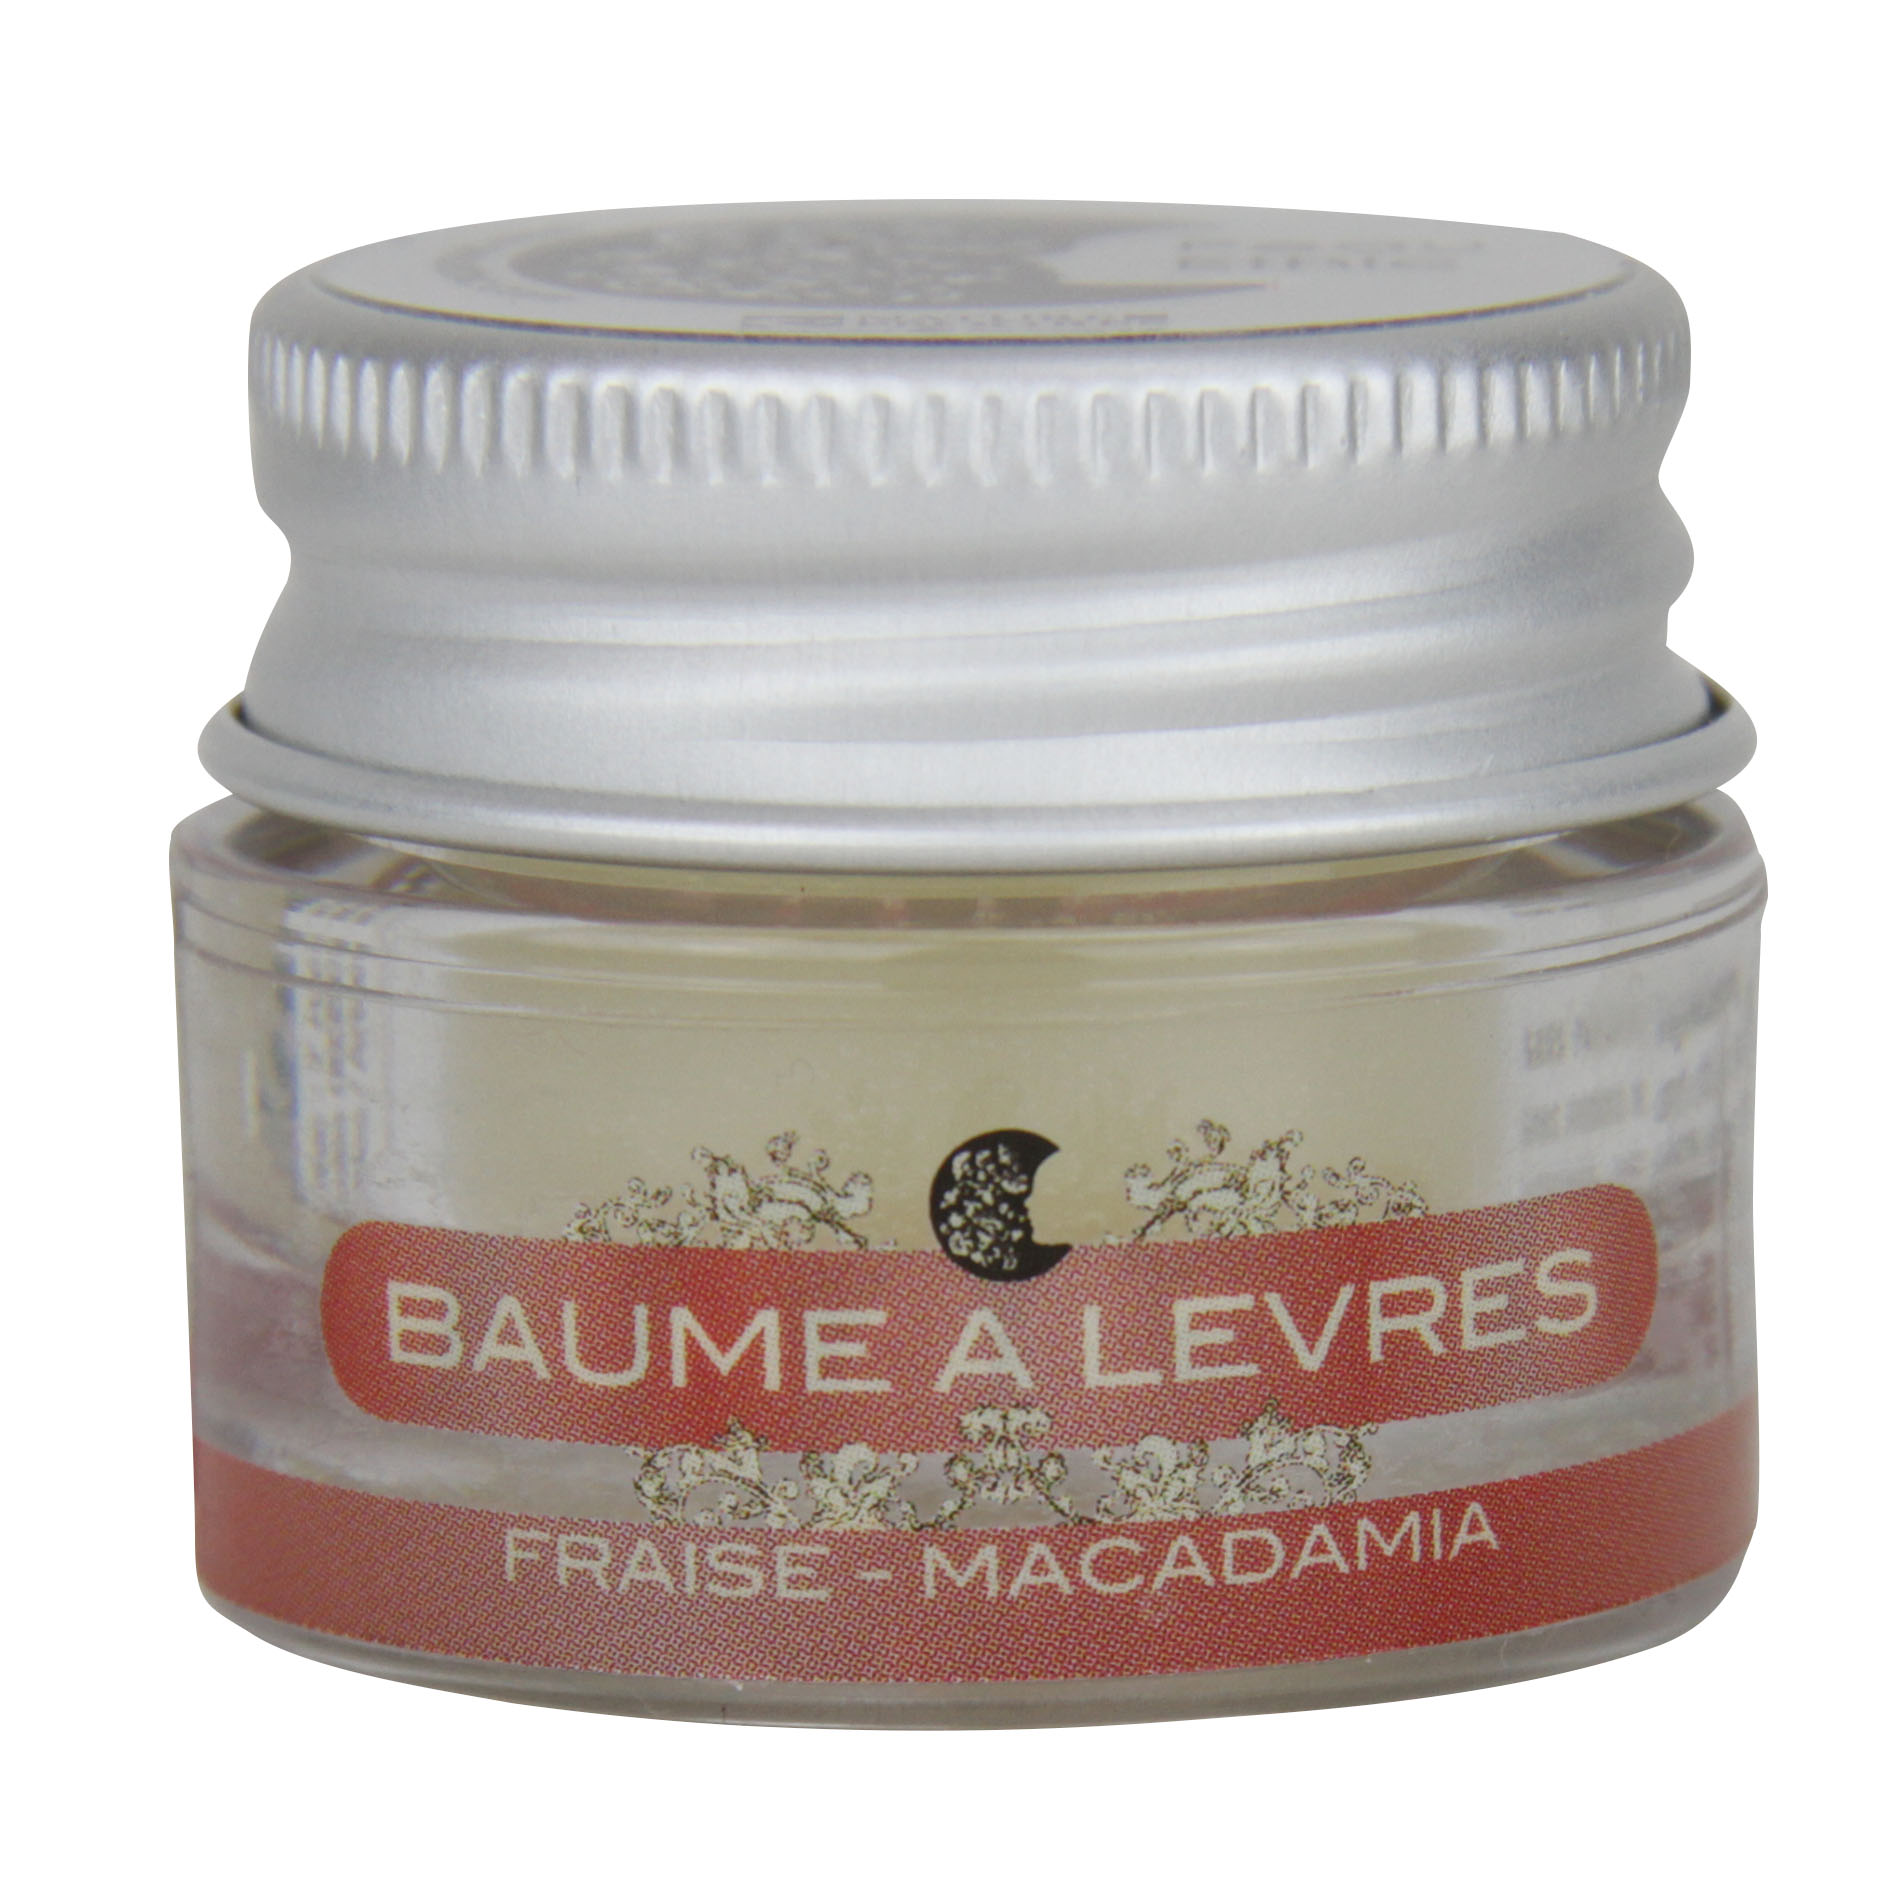 Baume Fraise-Macadamia